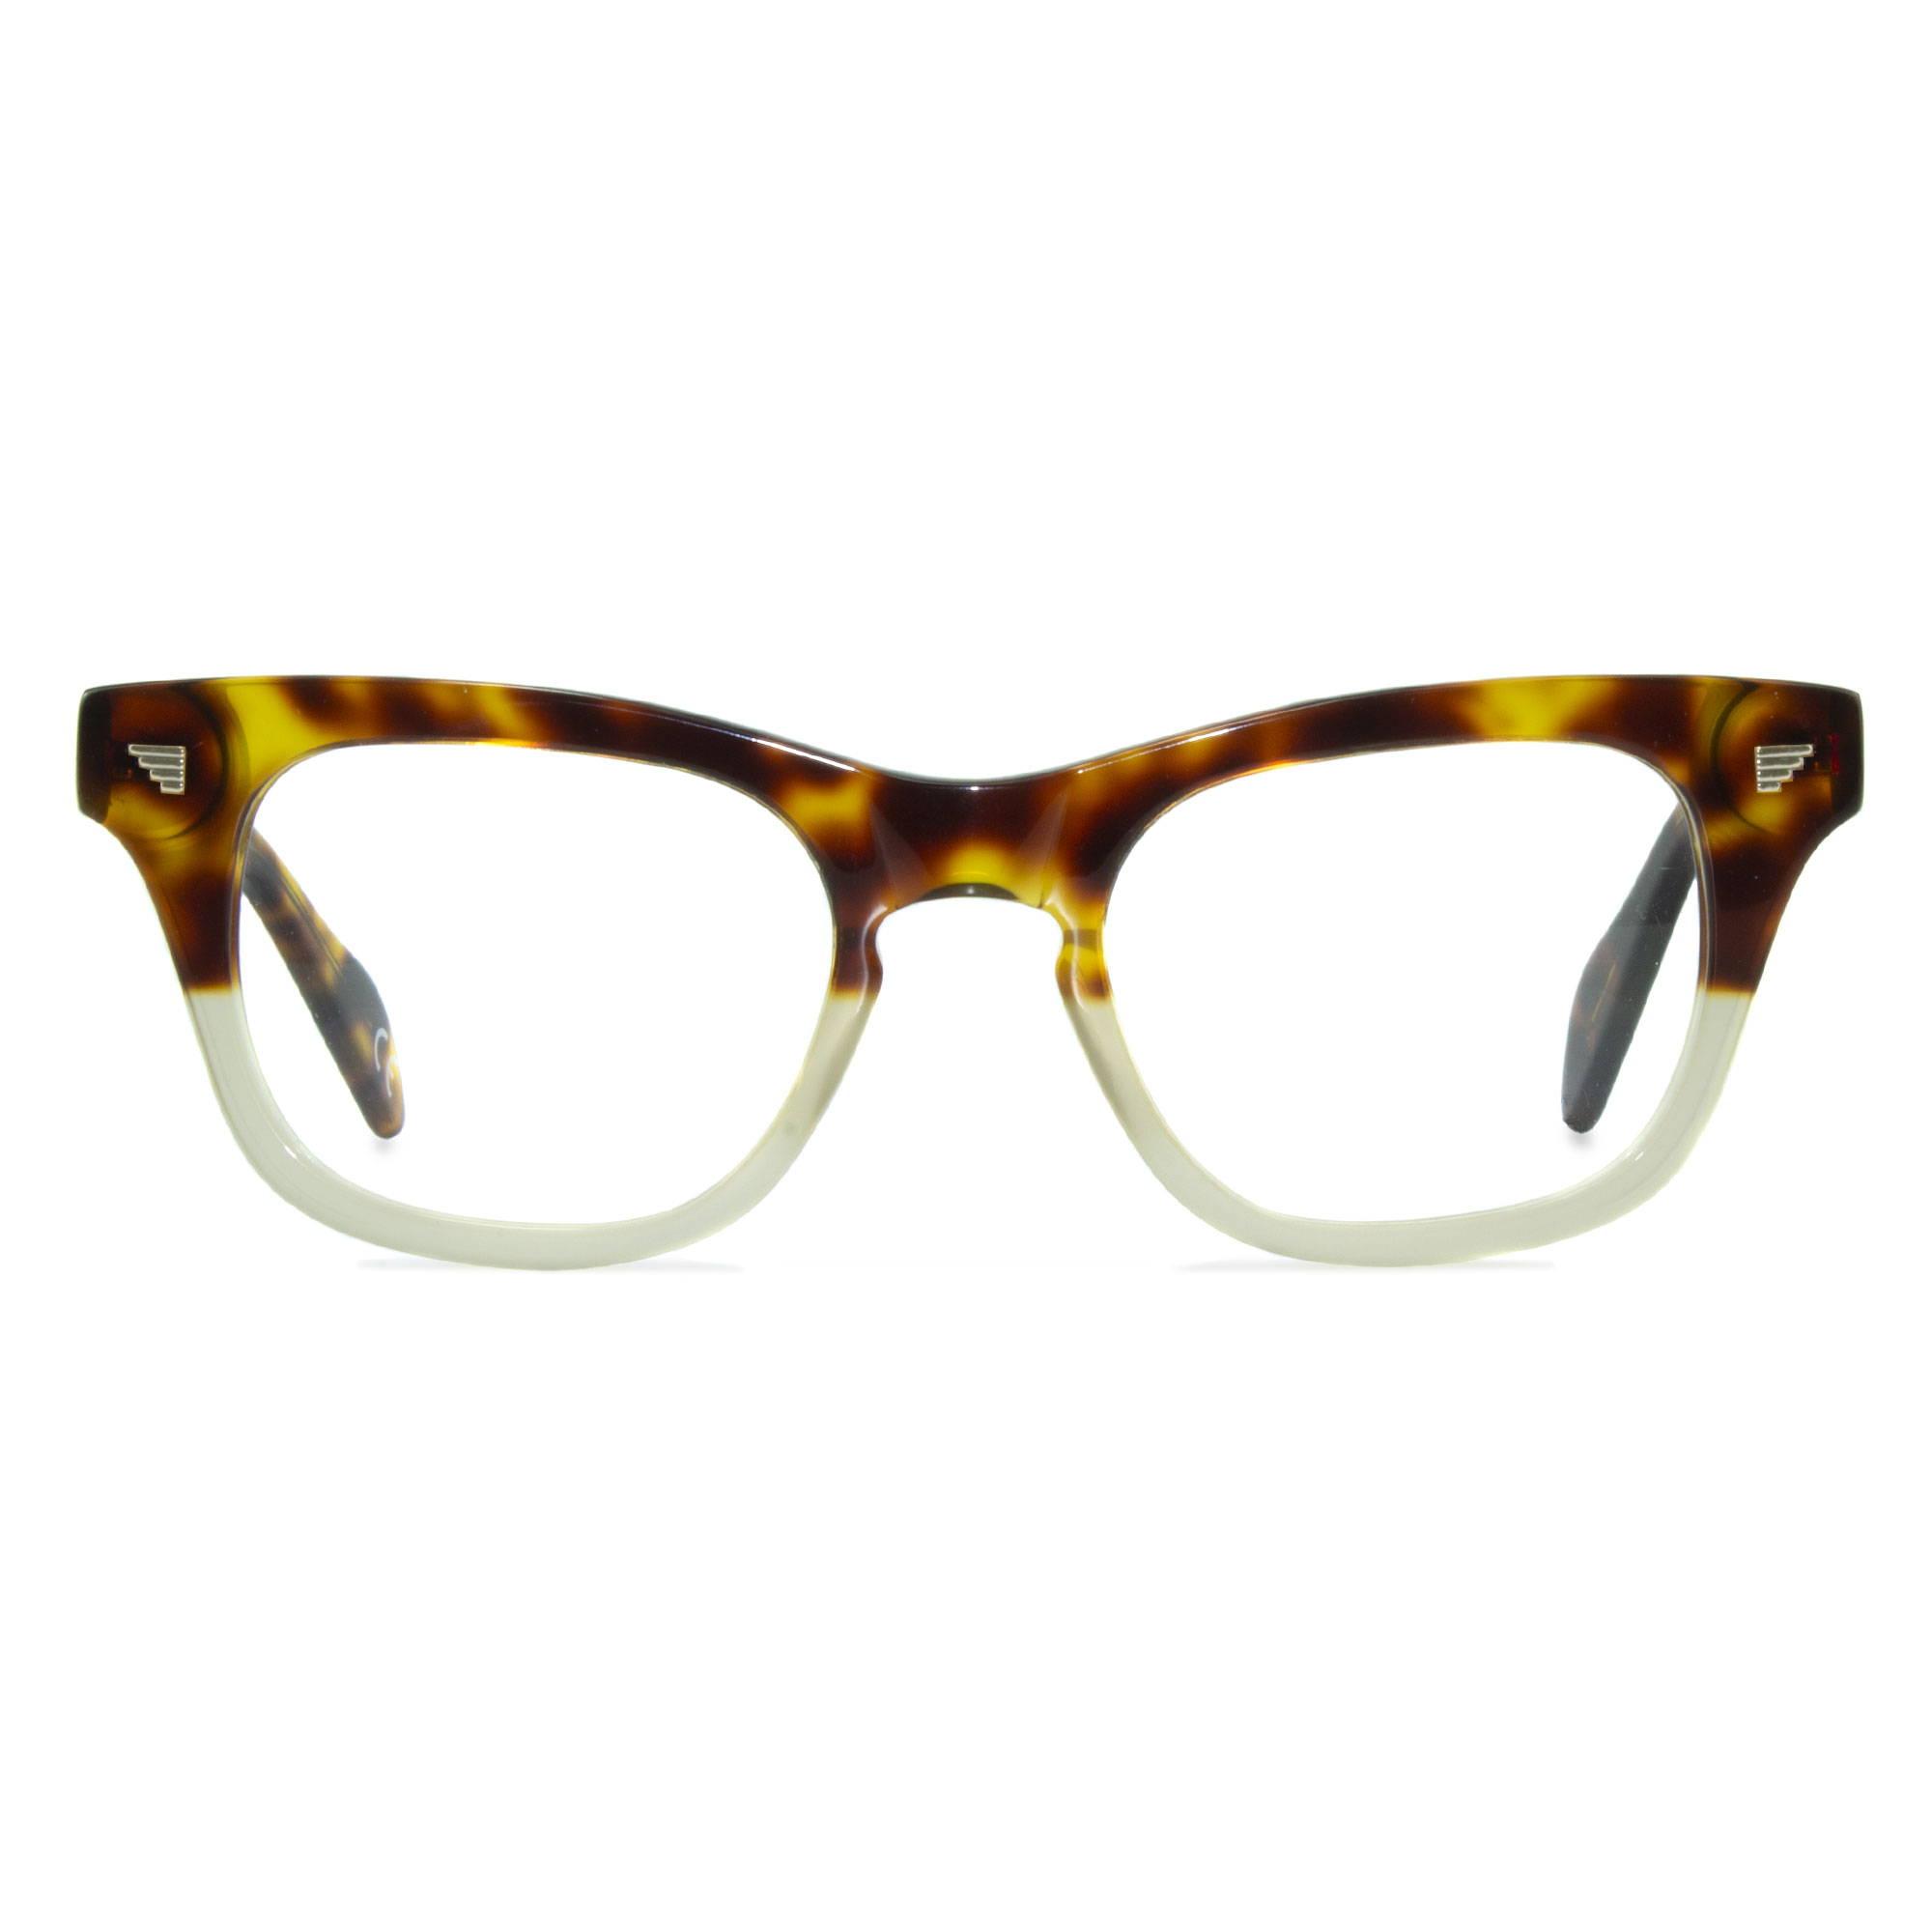 Joiuss russ tortoiseshell glasses